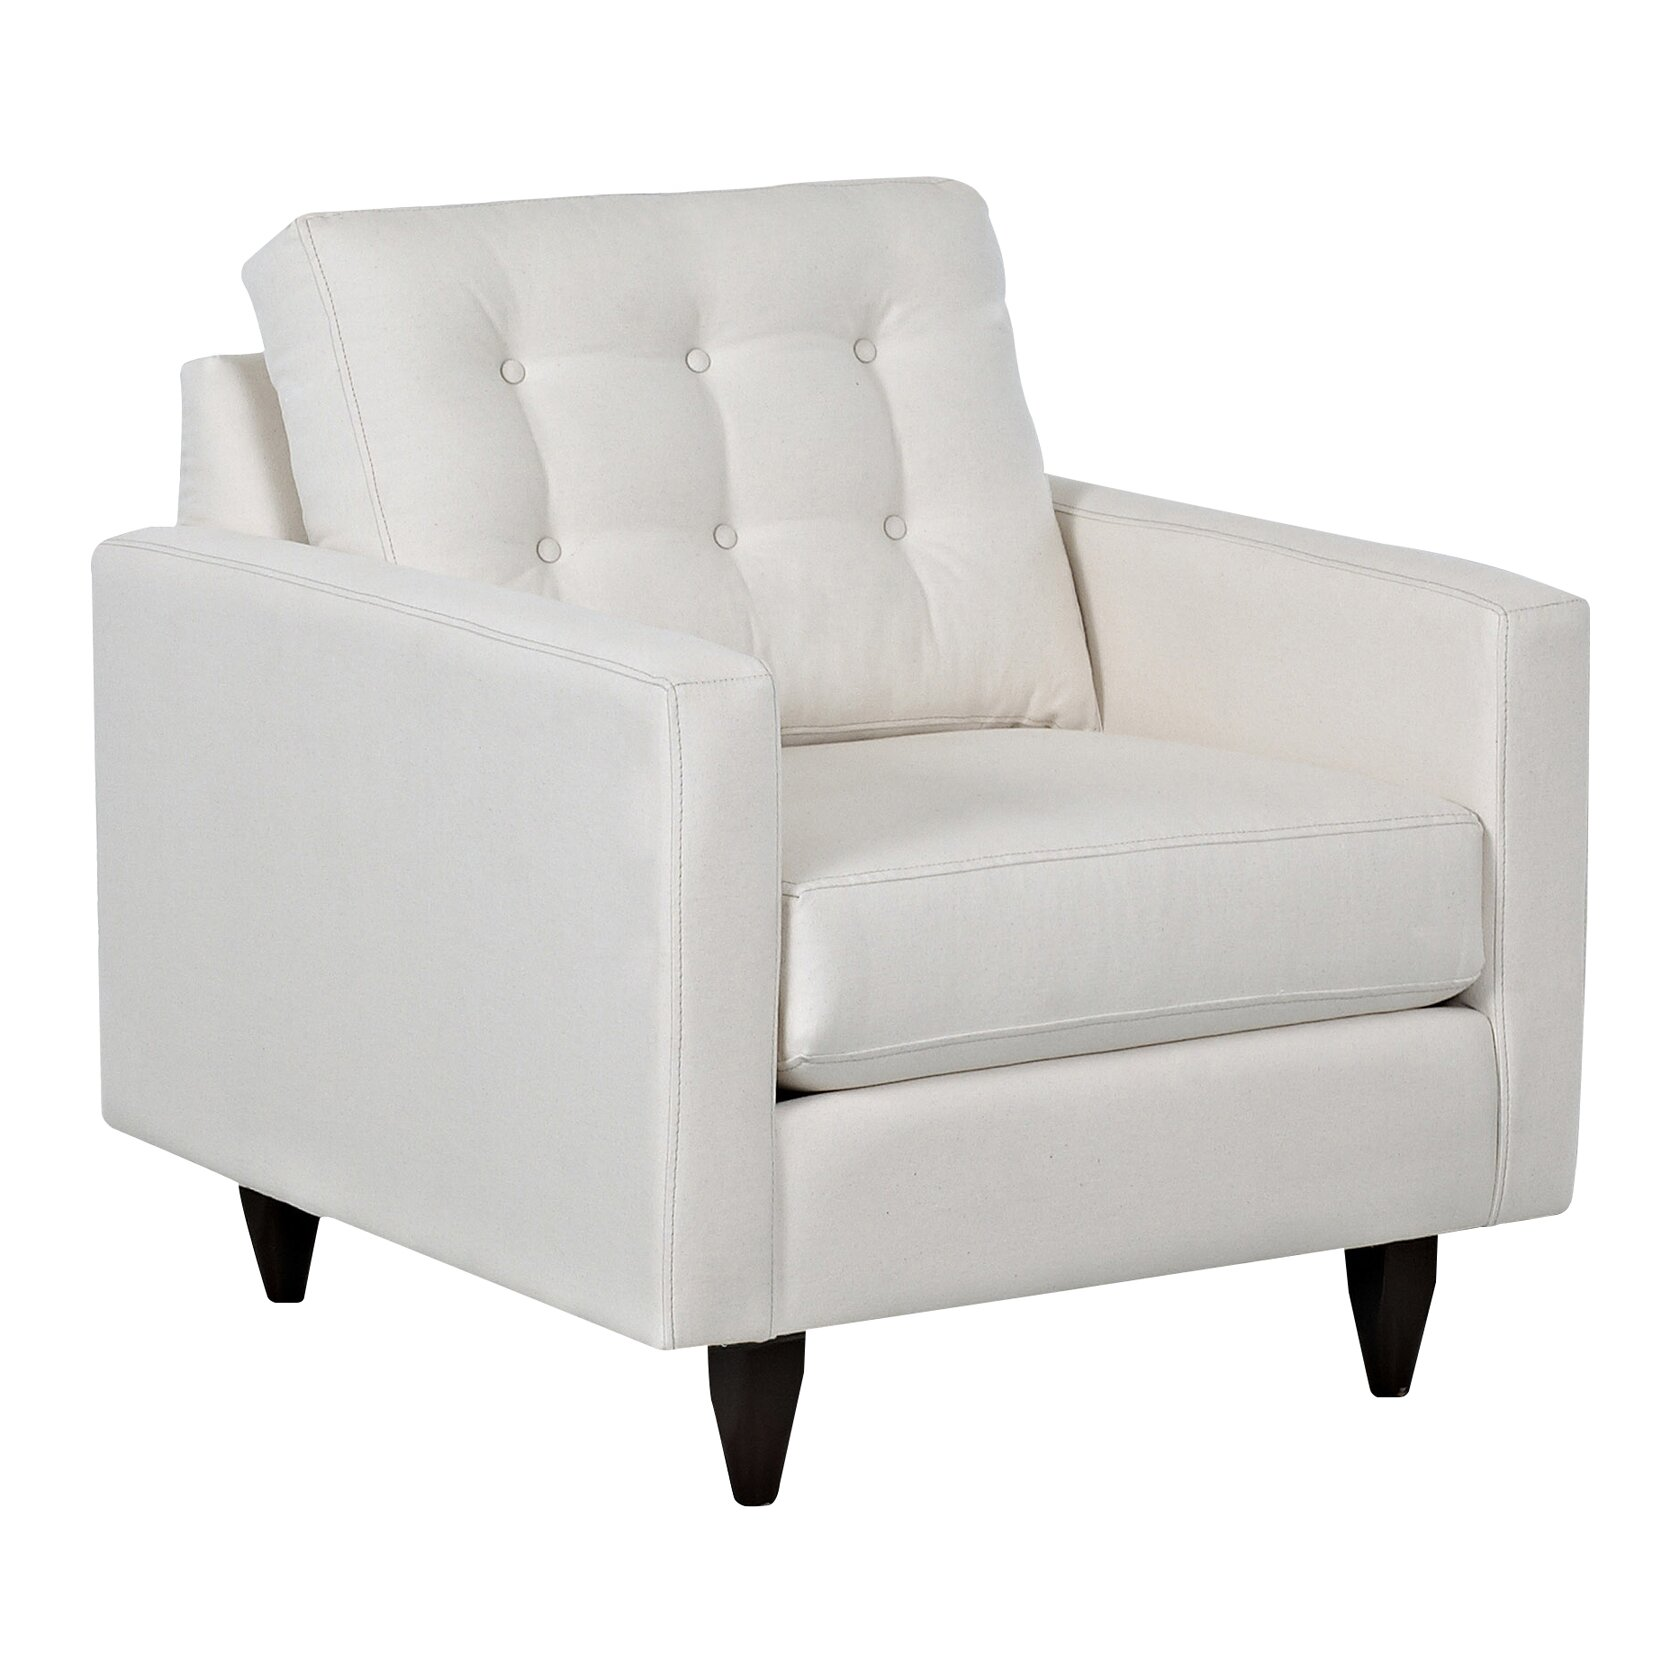 Wayfair Furniture Com: Wayfair Custom Upholstery Harper Arm Chair & Reviews